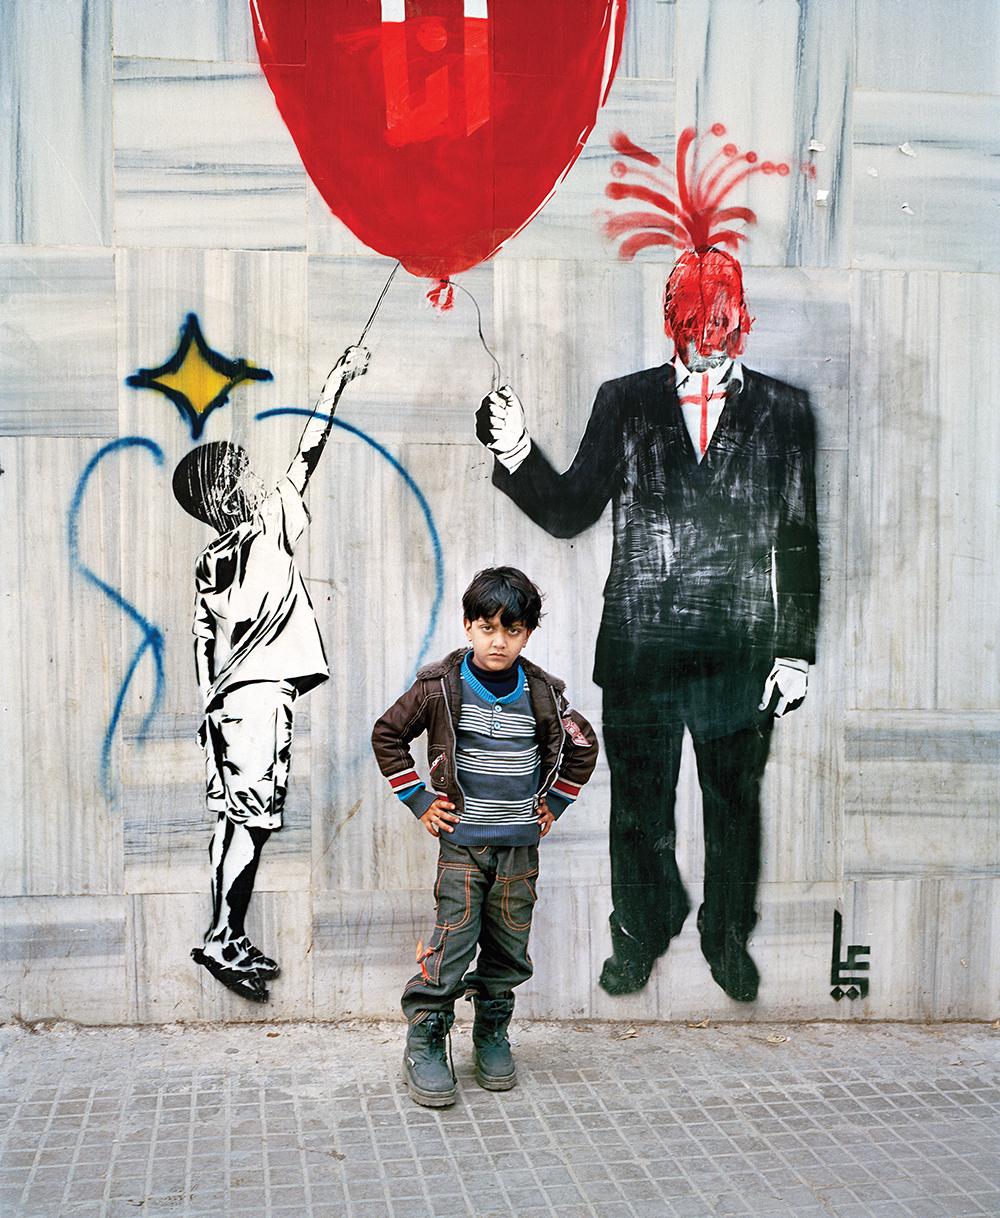 RANIA MATAR, Tamer 6, Beirut, 2015